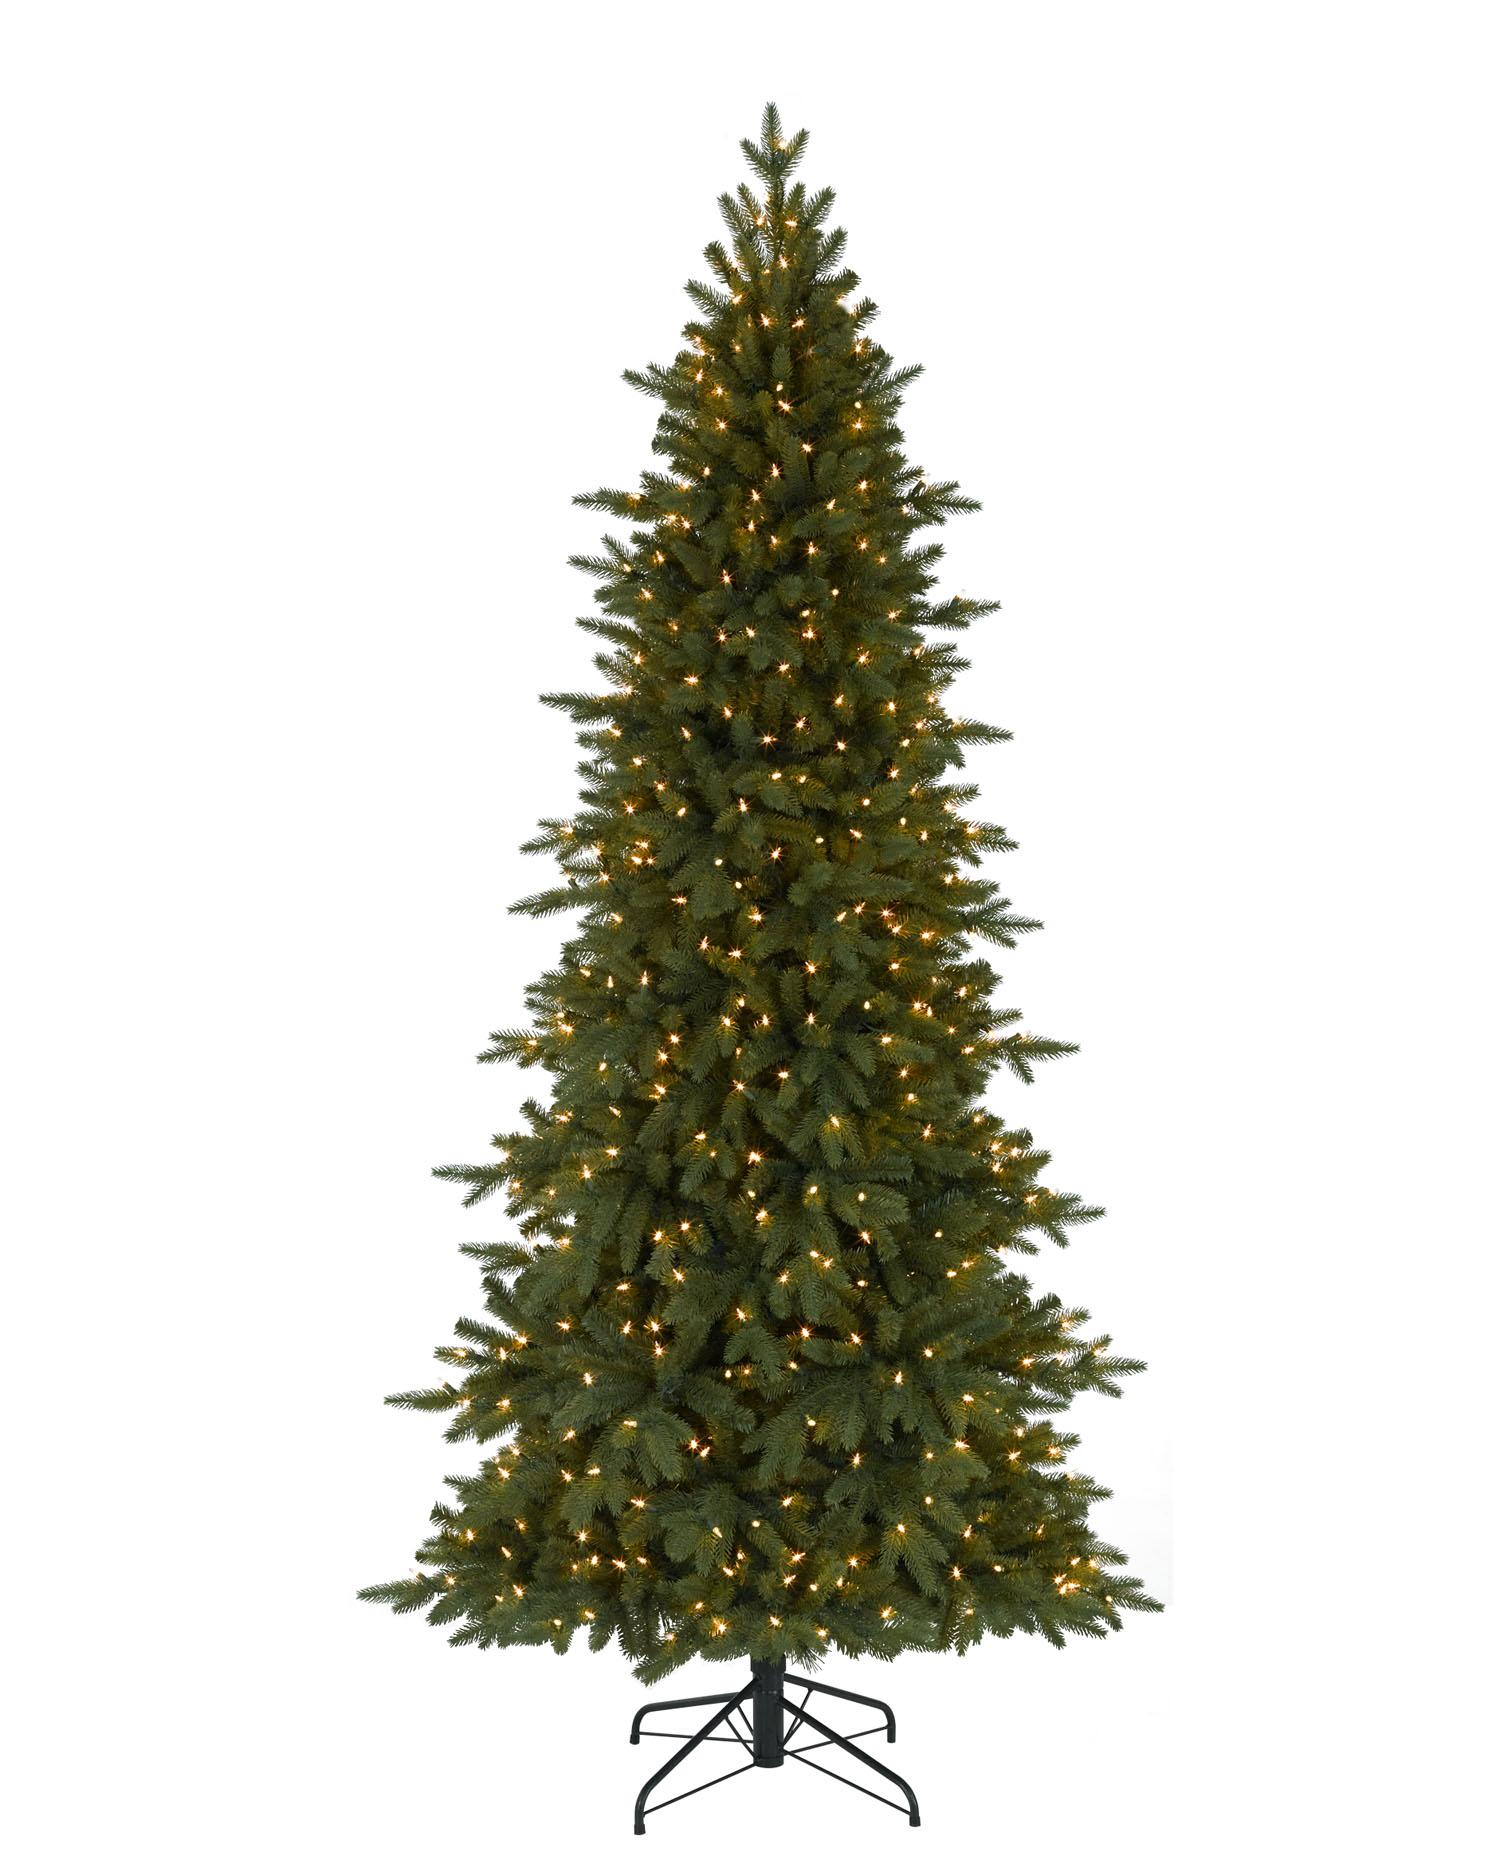 75 foot kennedy fir clear christmas tree - 2 Ft Christmas Tree